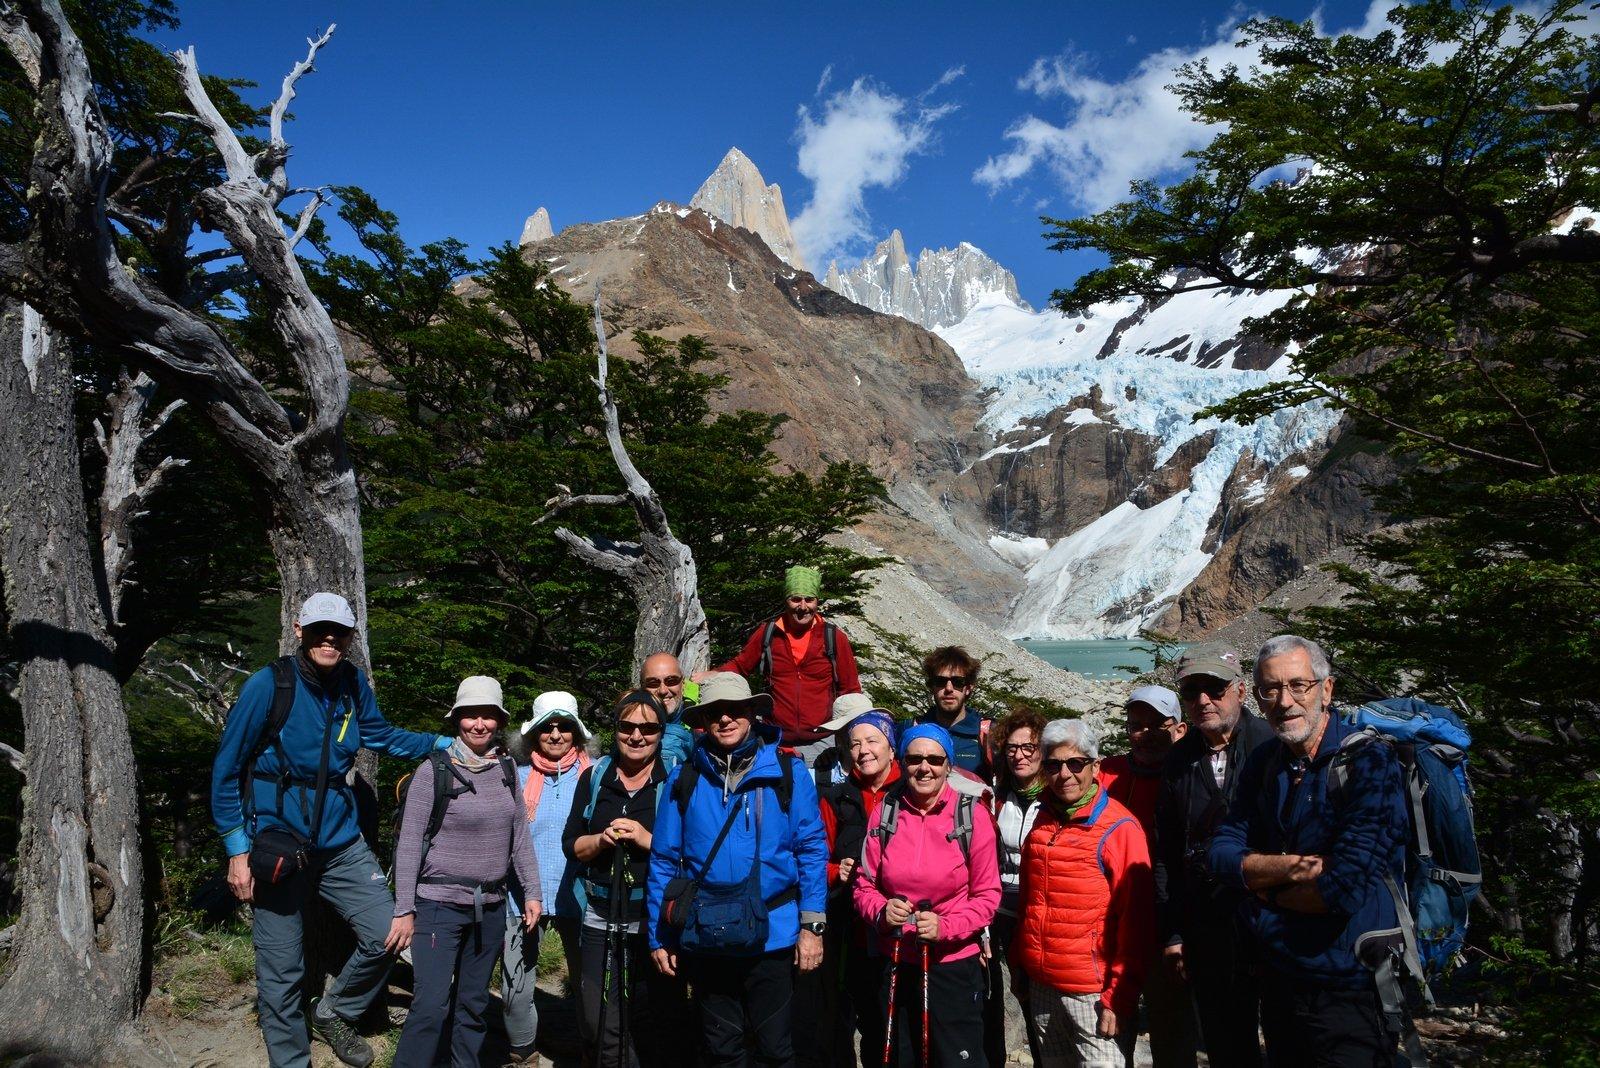 ghiacciaio-Piedras-Blancas-patagonia